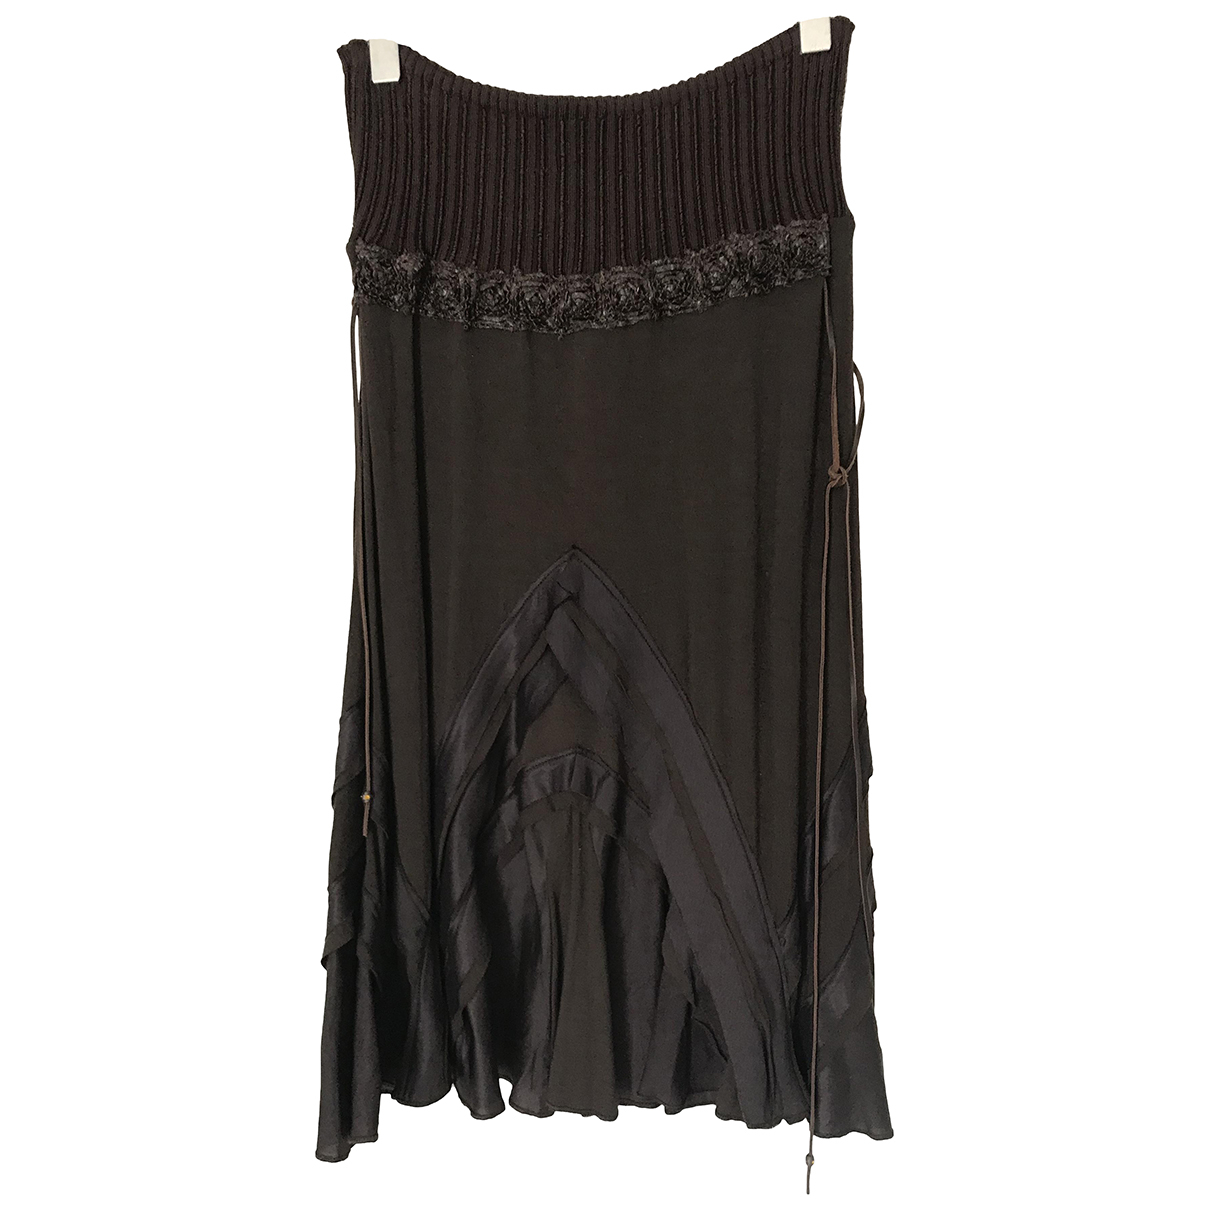 Class Cavalli N Brown skirt for Women 42 IT